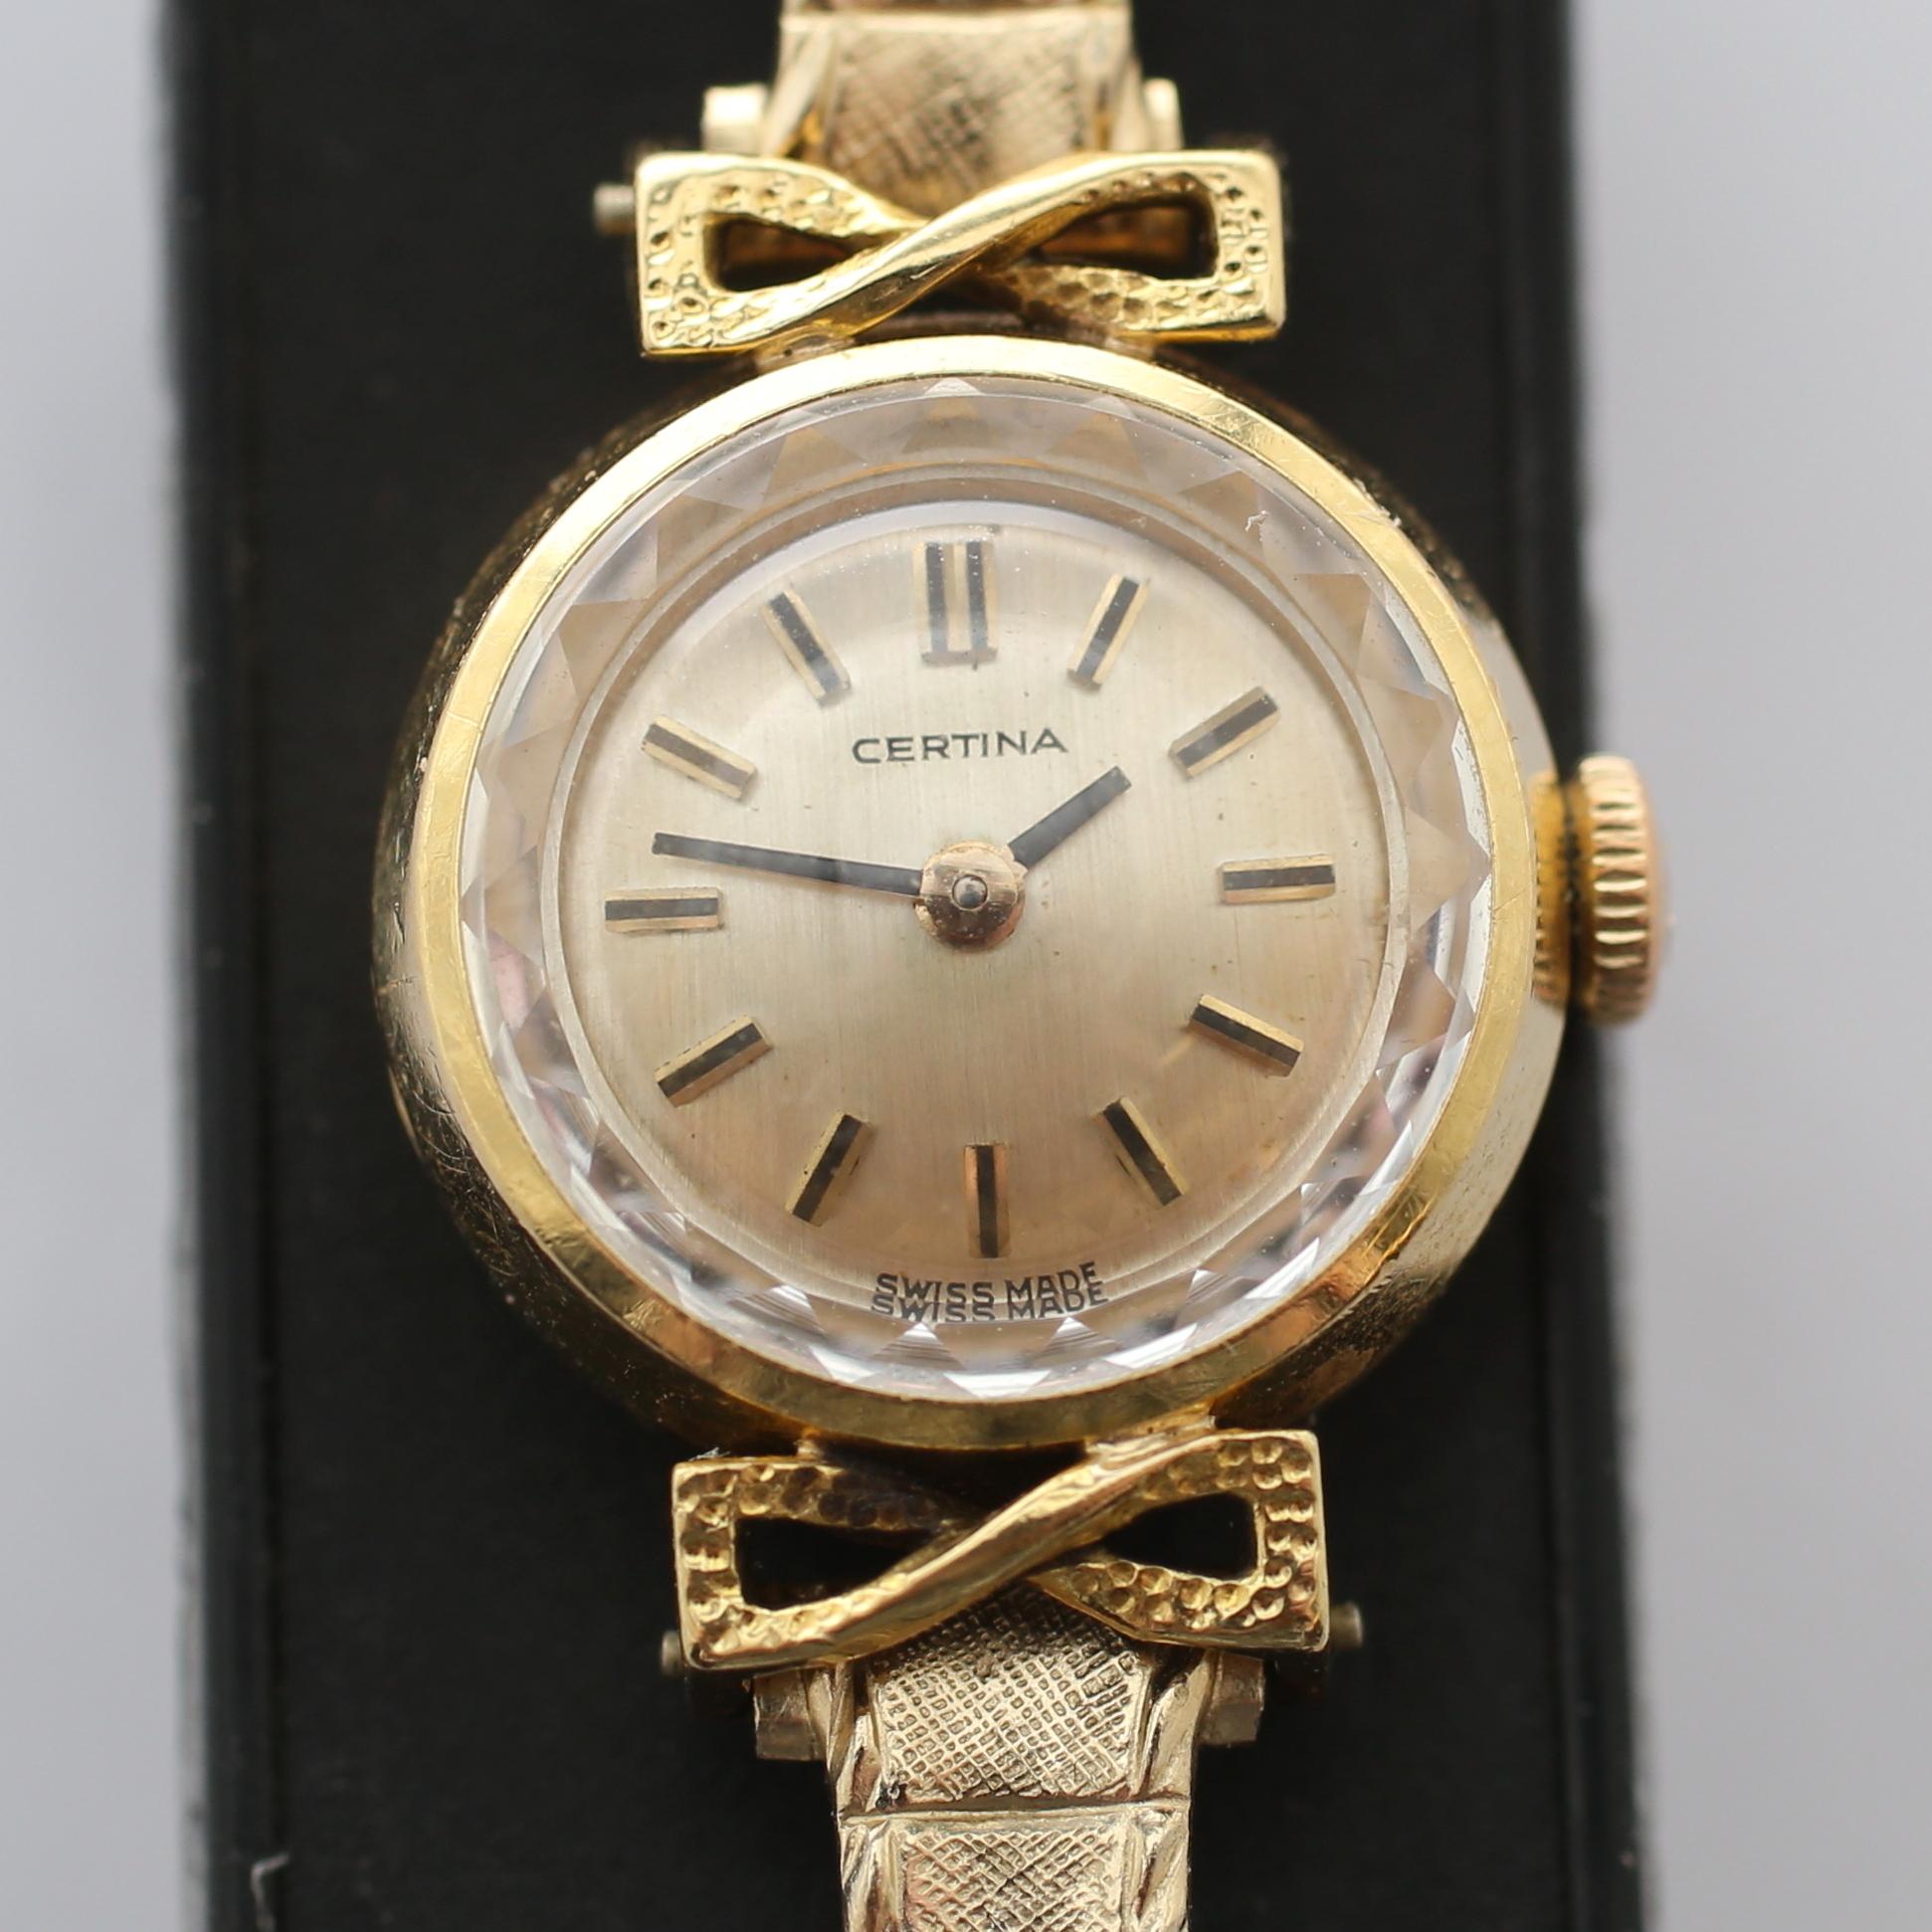 Wristwatches Wristwatches GoldClocksamp; GoldClocksamp; Auctionet DamenuhrCertina18k Watches Auctionet DamenuhrCertina18k DamenuhrCertina18k Watches GoldClocksamp; L34j5RqA